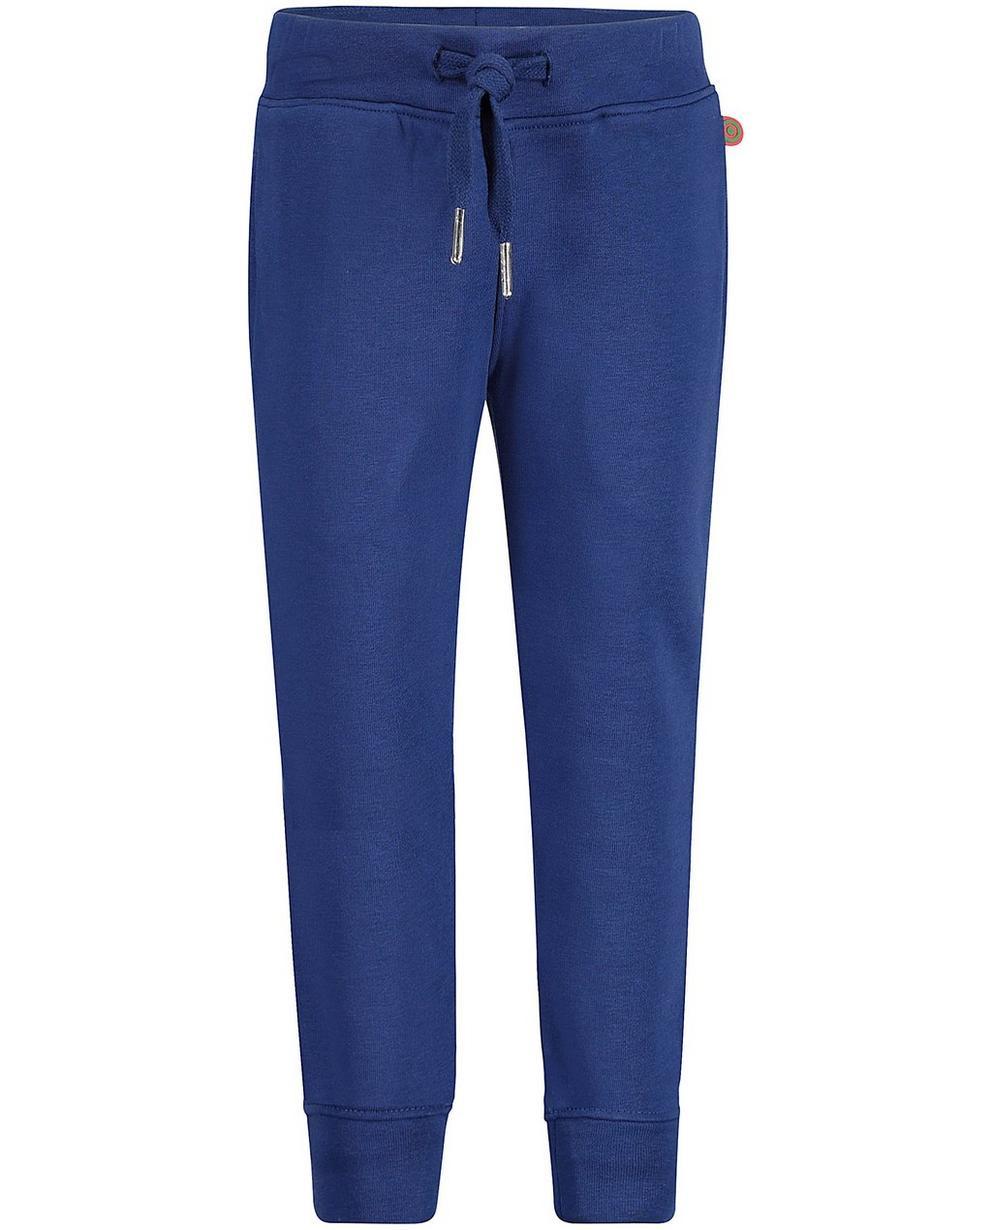 Pantalons - navy - Donkerblauwe sweatbroek